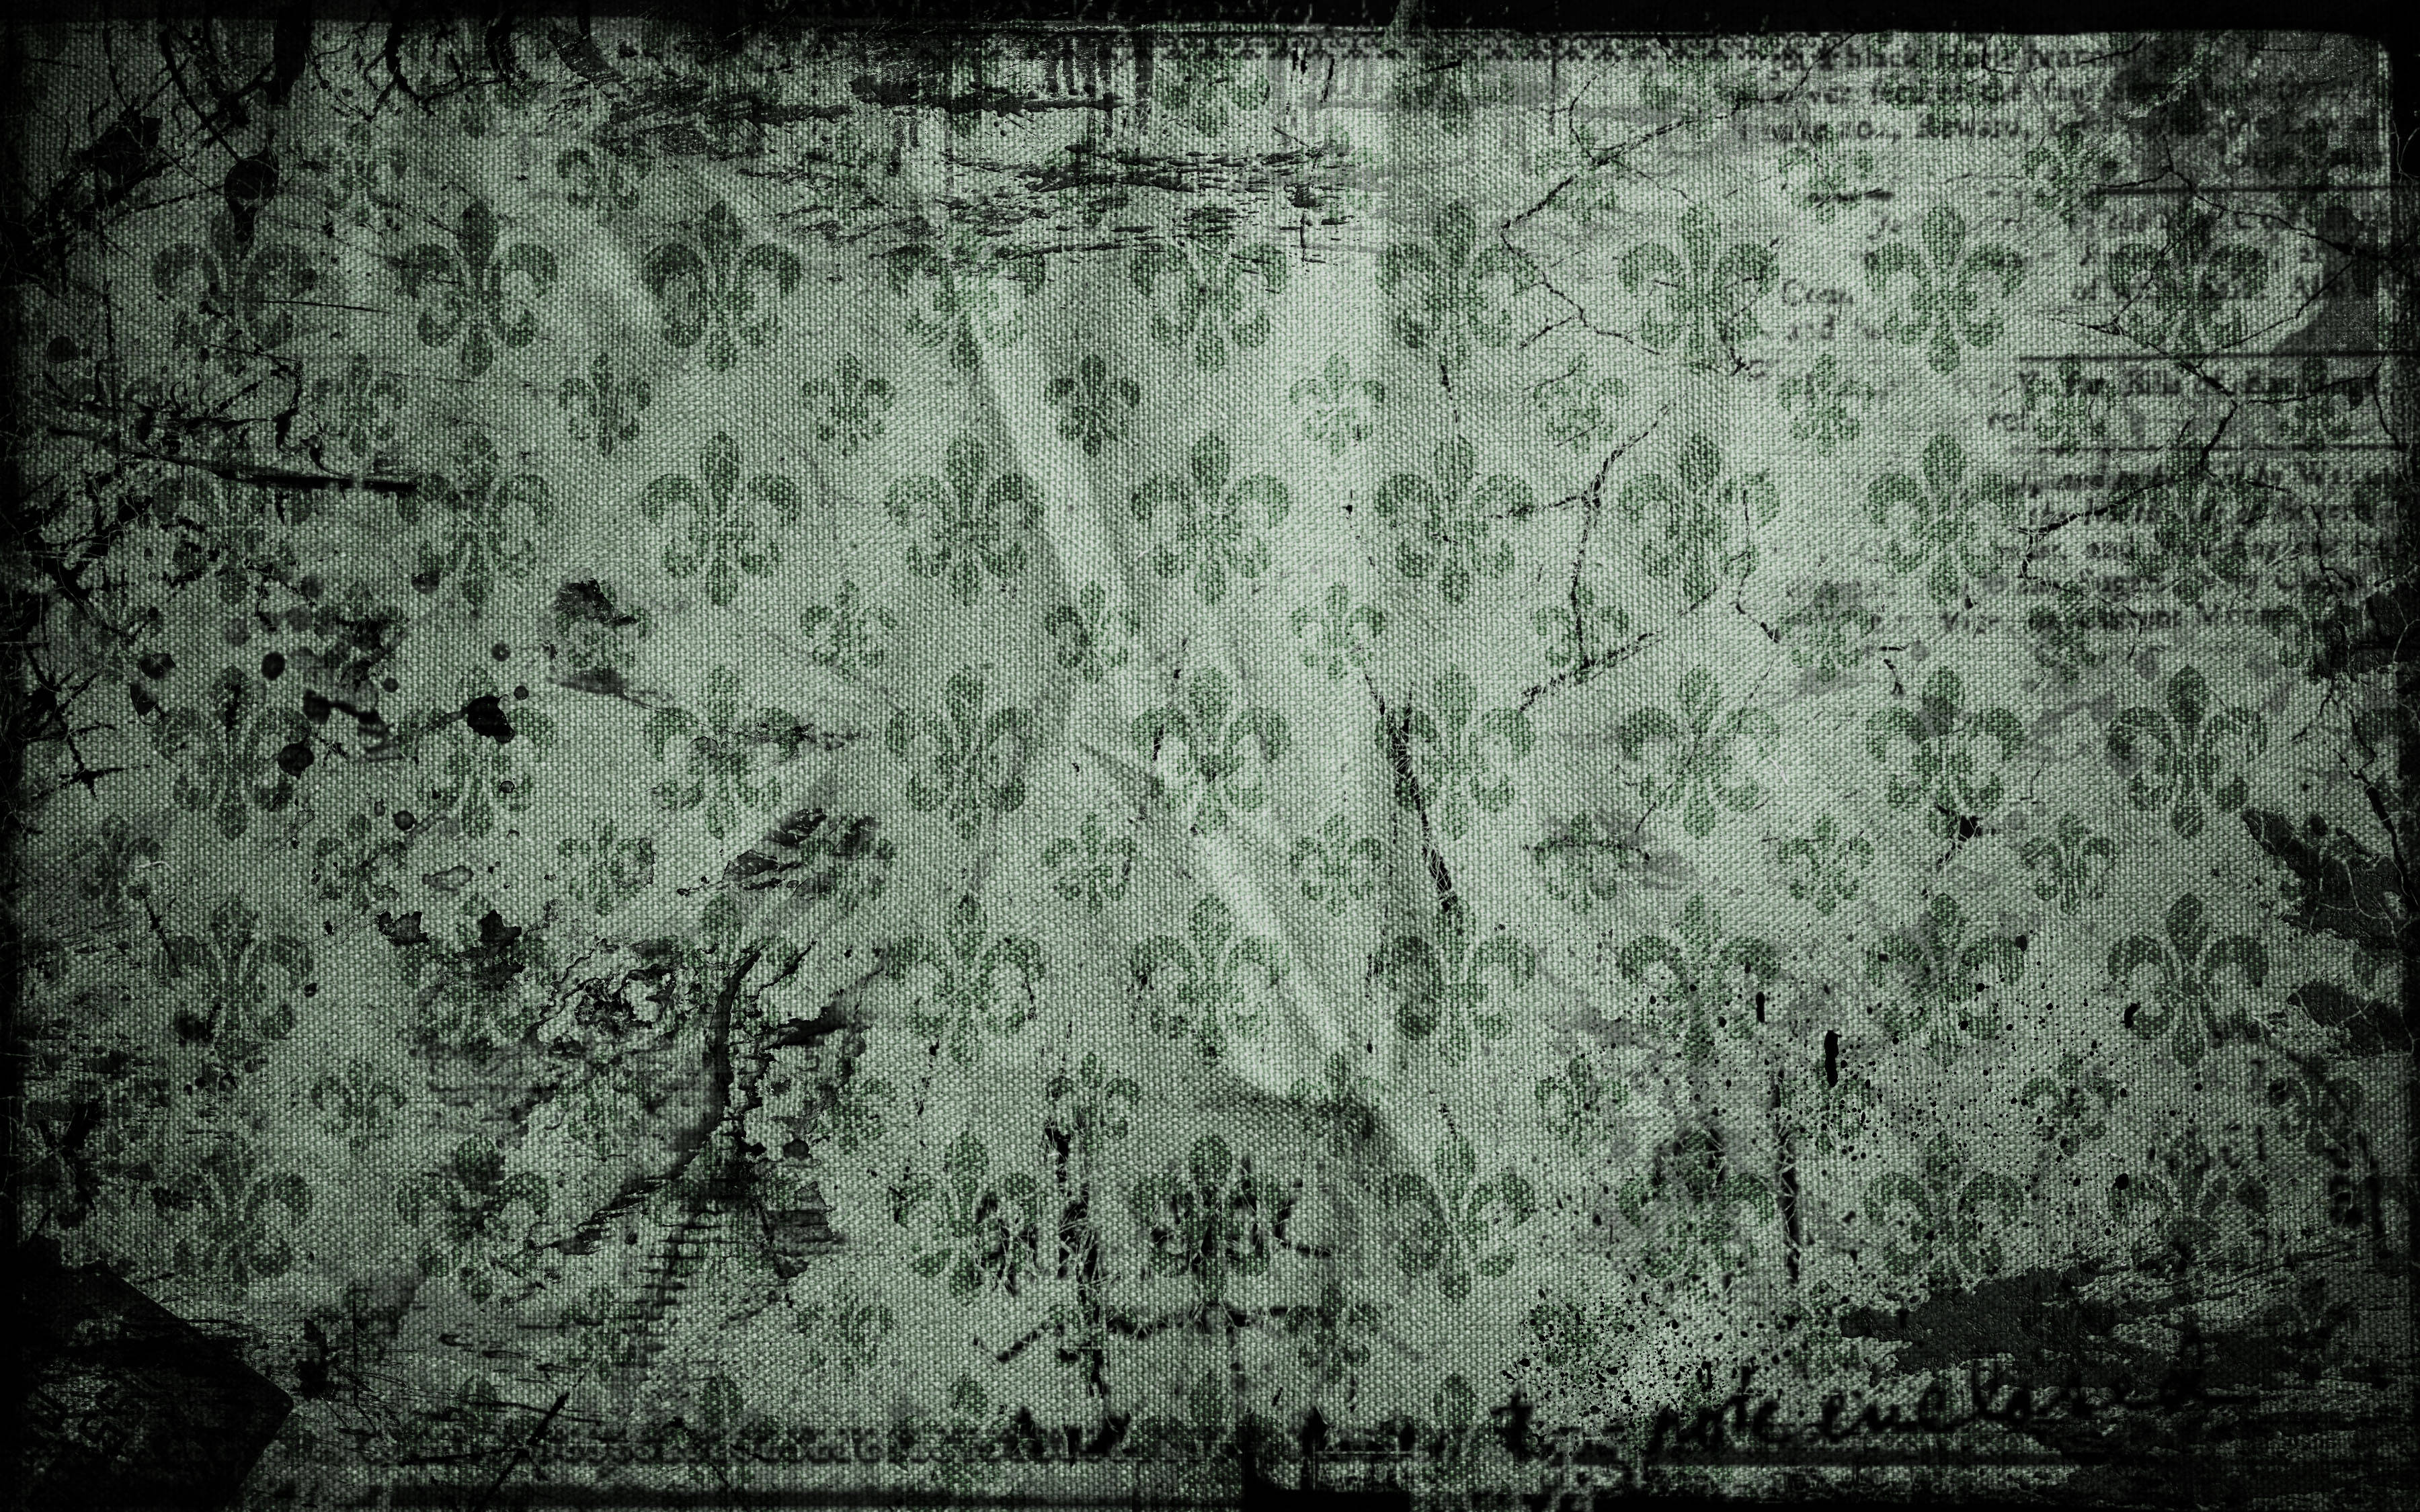 Vintage Patterns 36002250 Wallpaper 804076 3600x2250